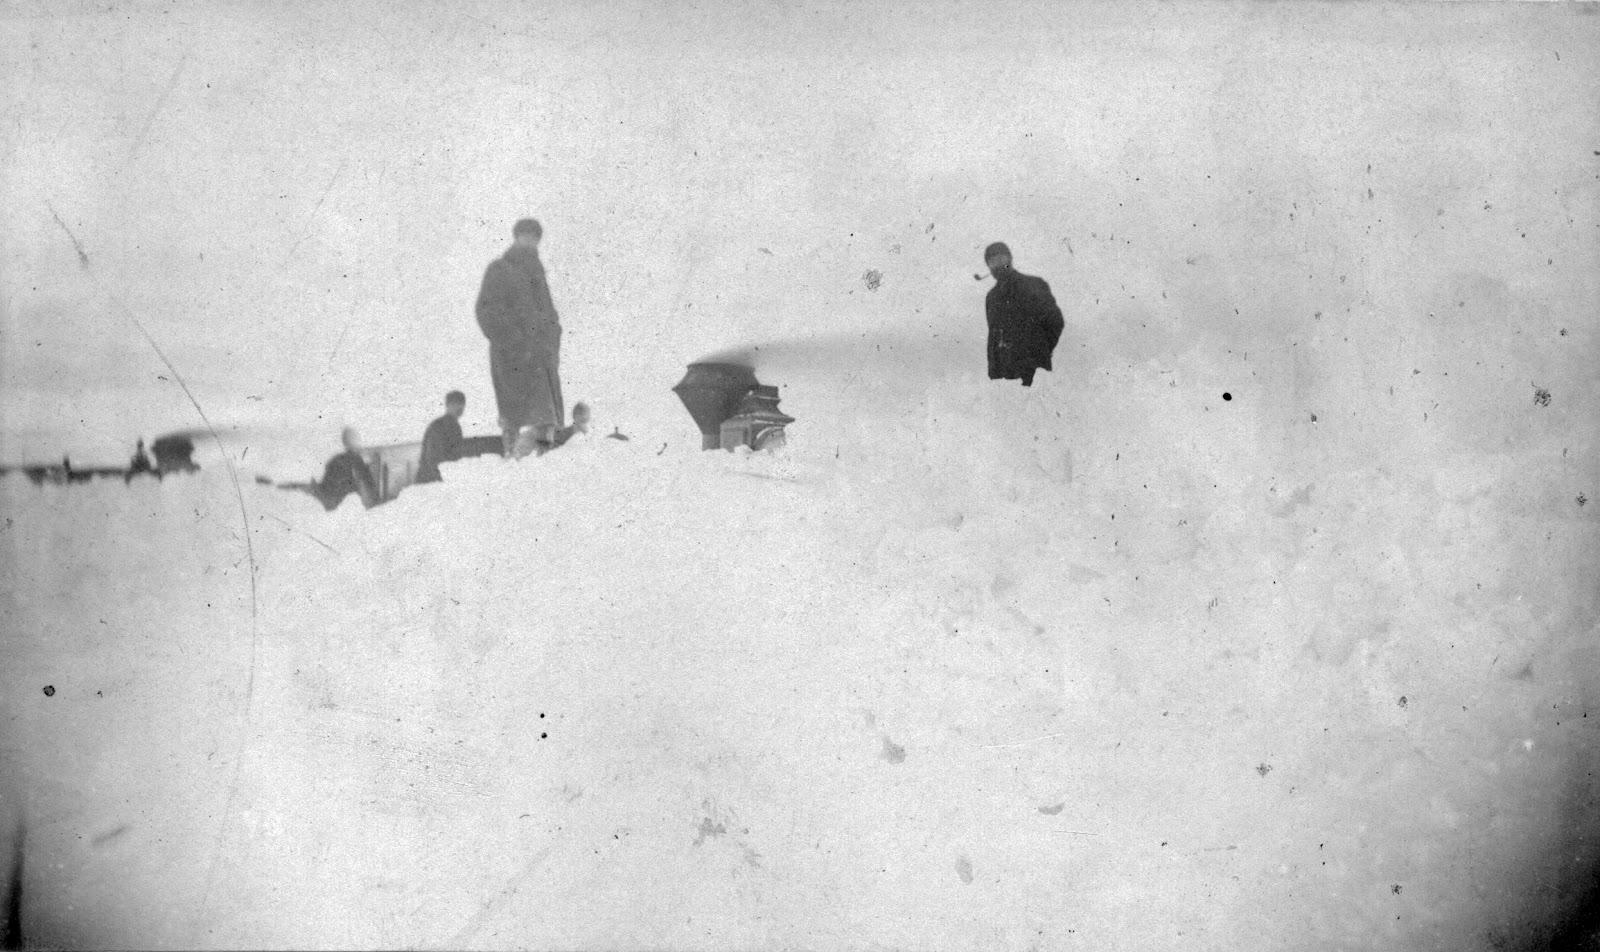 Narrow gauge engine stuck in snow drifts near Winnifred, 1887.  Courtesy the Galt Museum & Archives: 19760234134